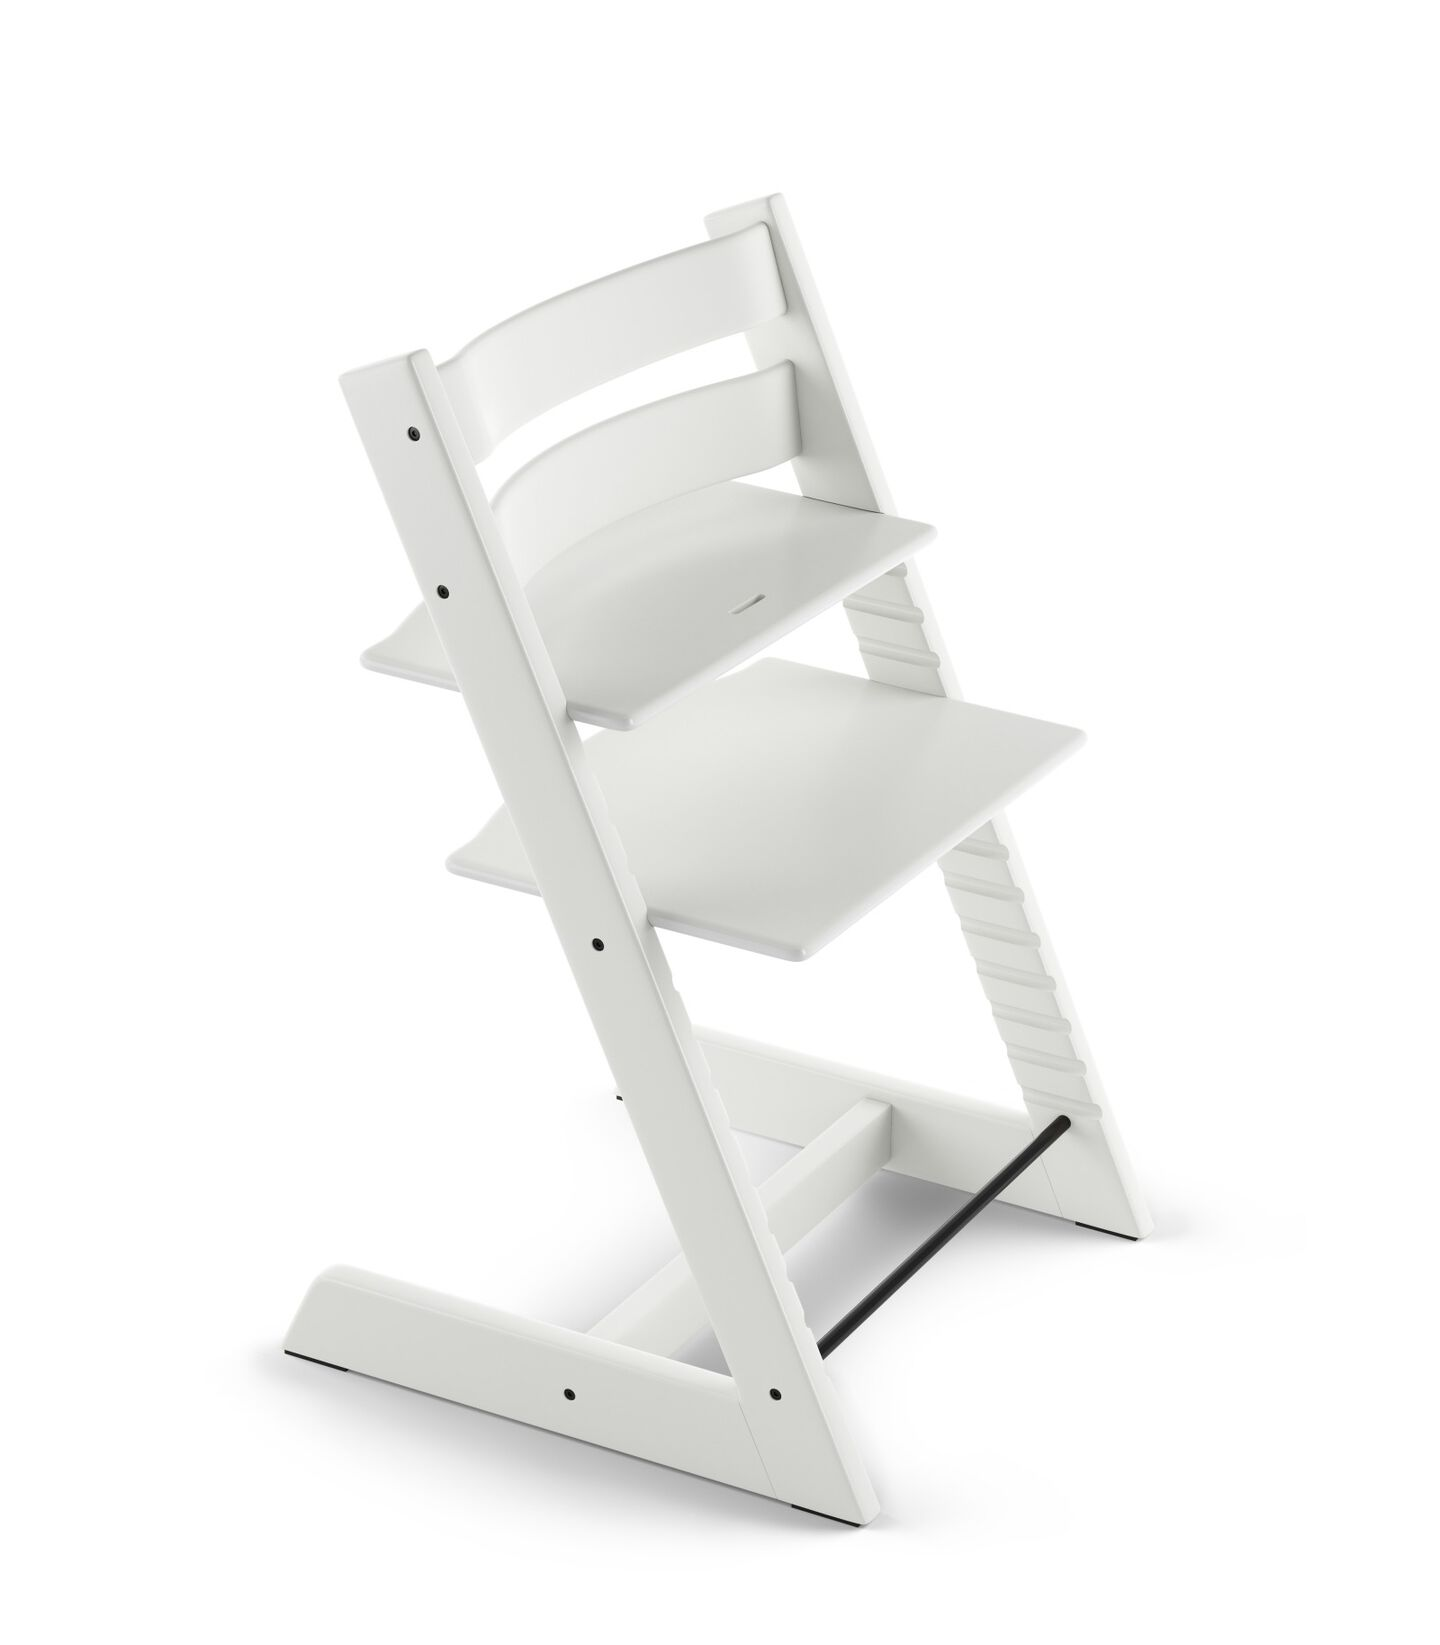 Tripp trapp barnestol white for Offerte stokke tripp trapp seggiolone